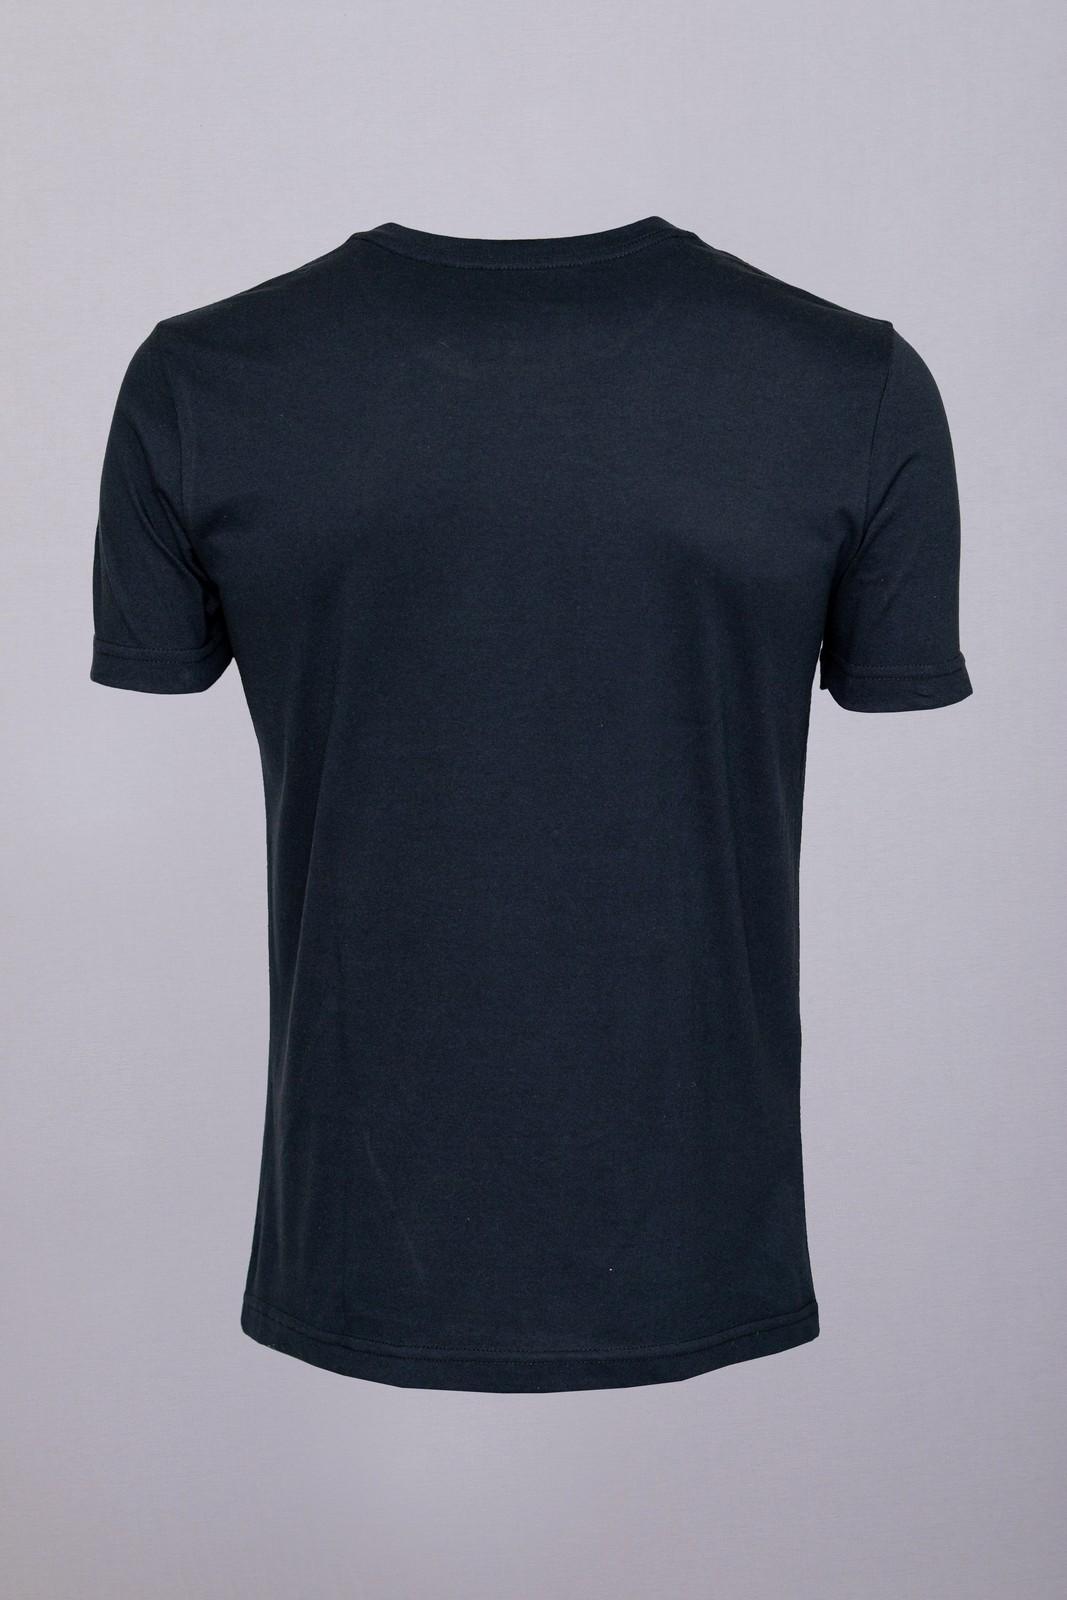 "Camiseta CoolWave ""X"" Preta"